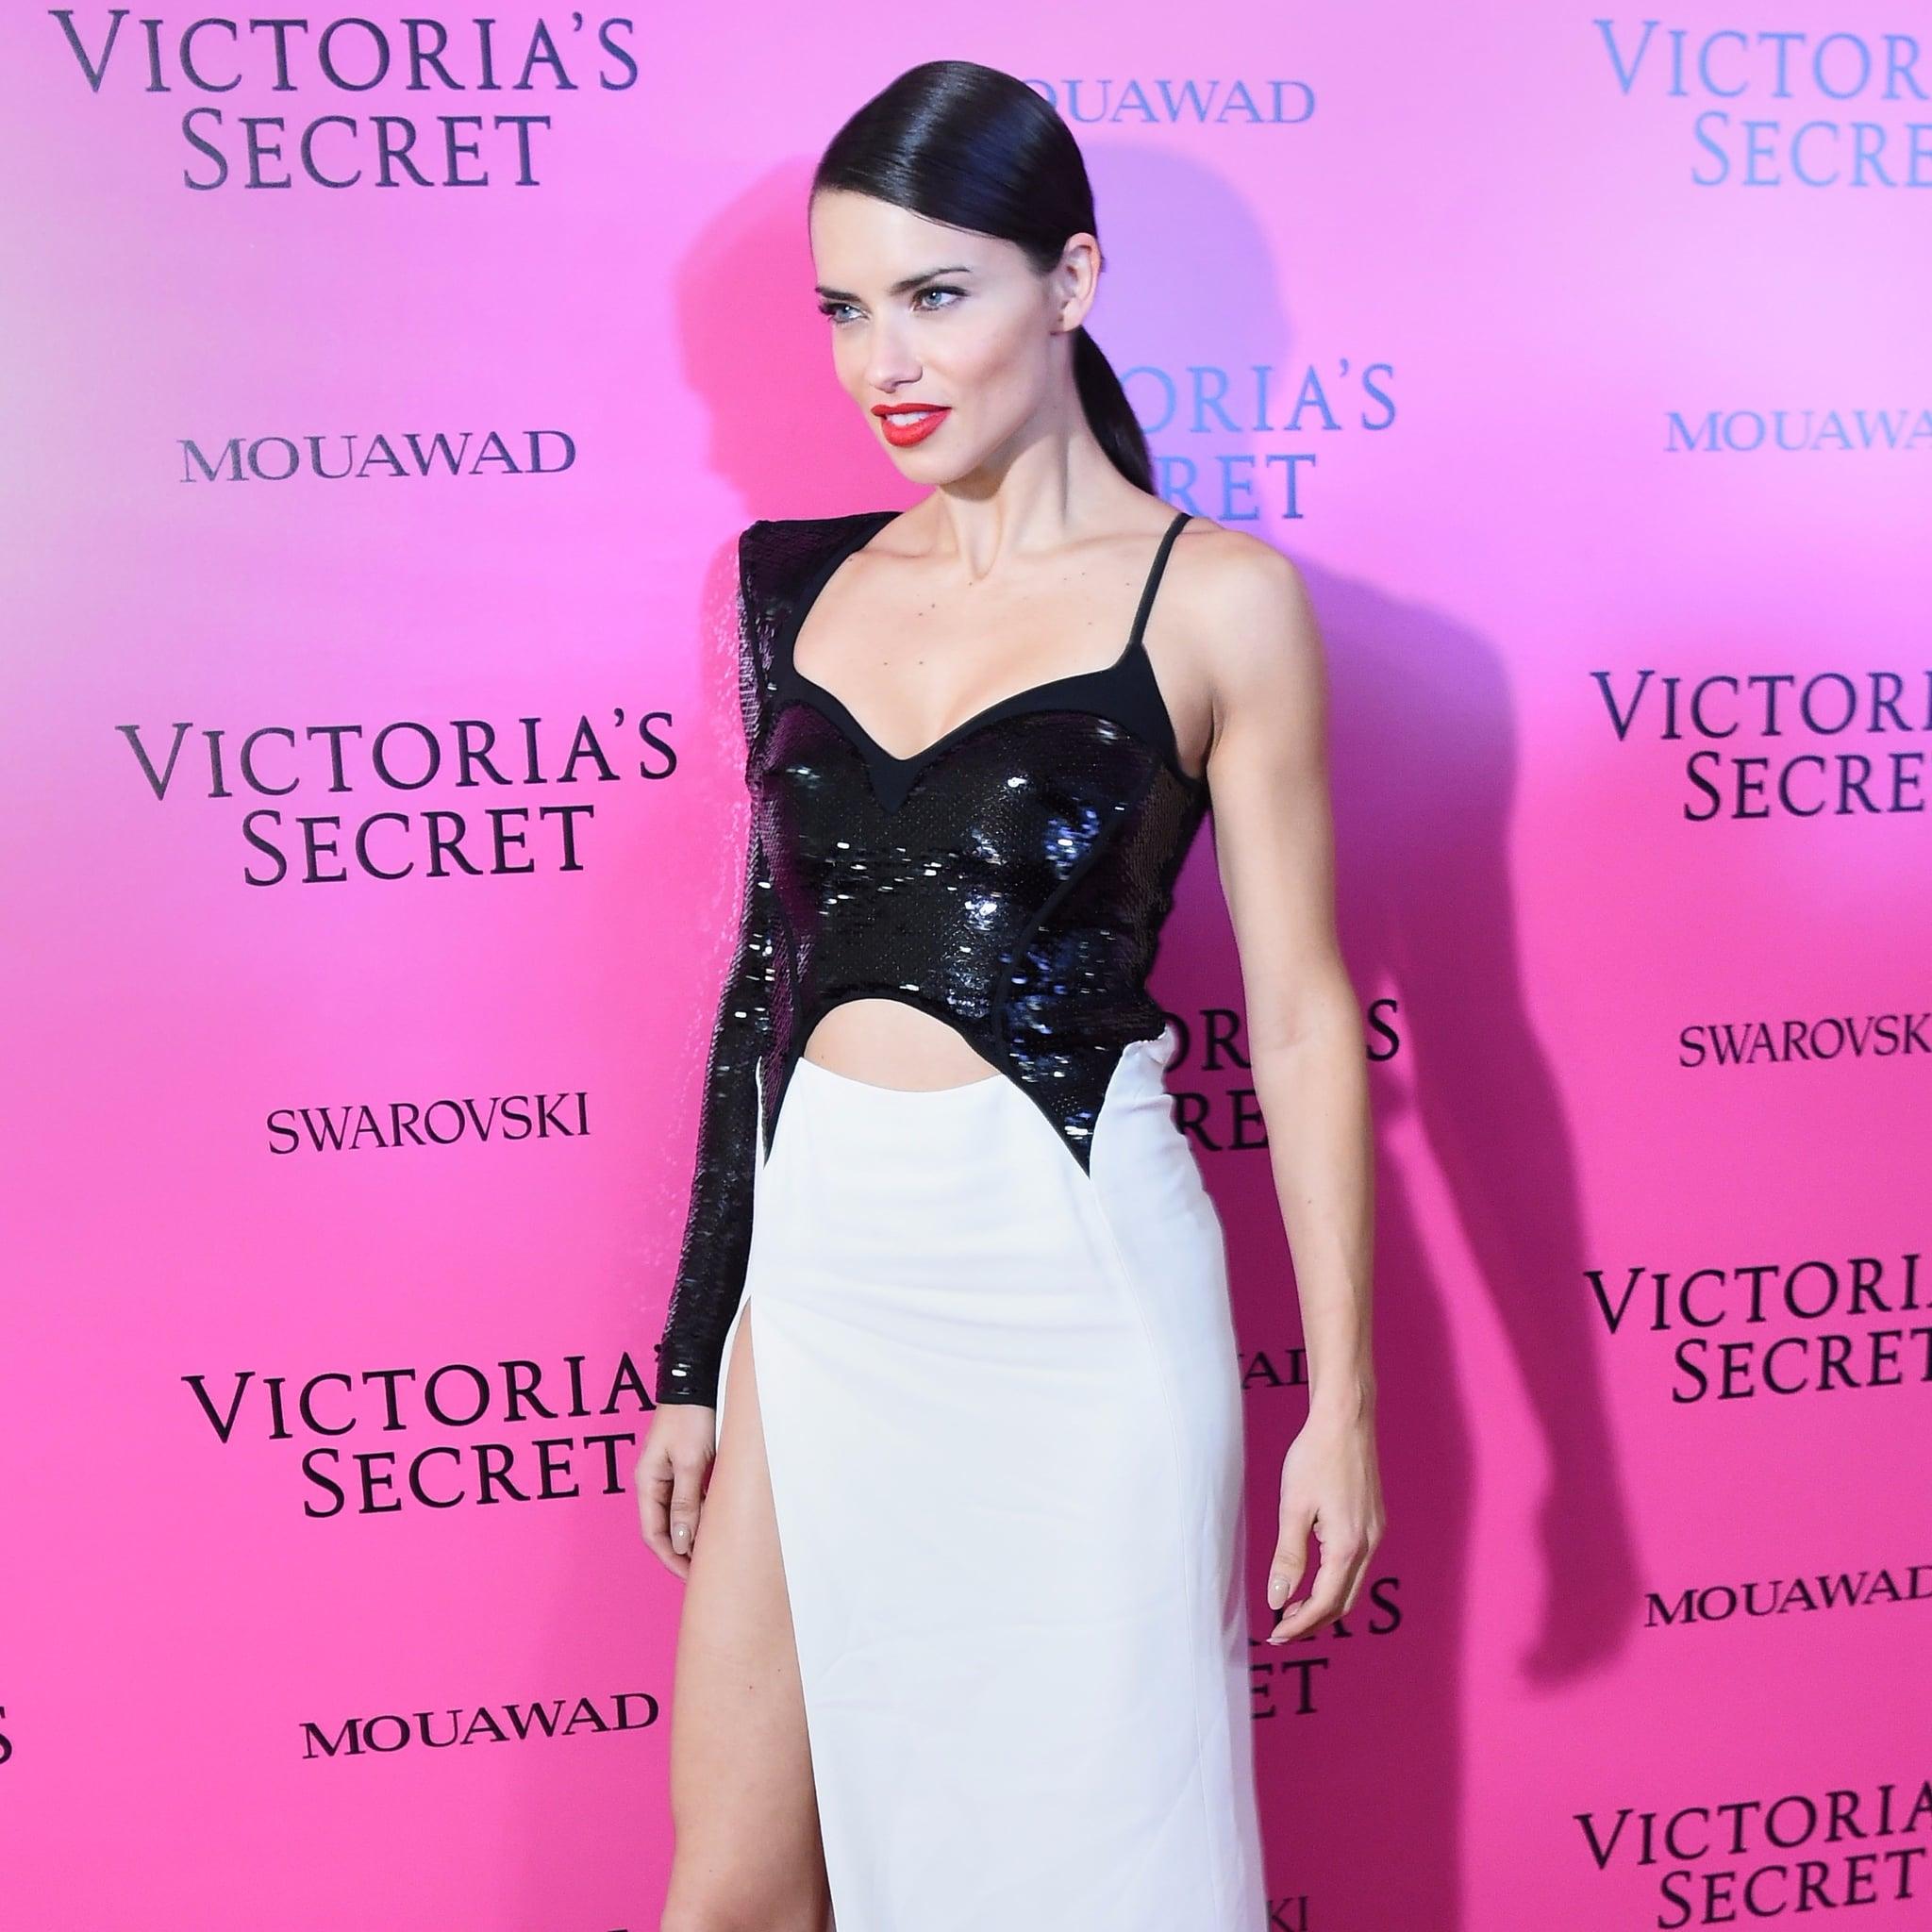 How To Make A Book Cover Out Of A Victoria S Secret Bag ~ Victorias secret fashion show afterparty dresses 2017 popsugar